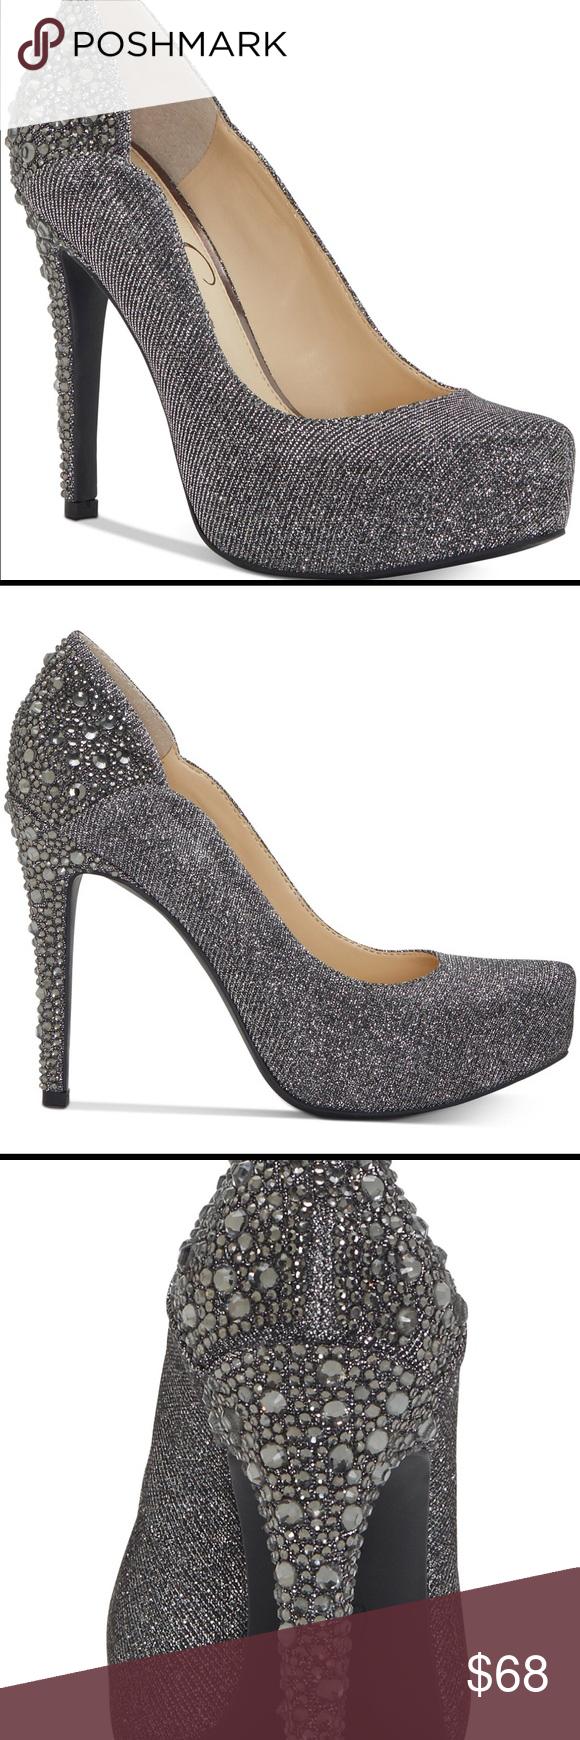 76e0c8264f1 Jessica Simpson Pehyton Platform Pumps Shimmering rhinestones cascade down  the sleek stiletto heel of Jessica Simpson s